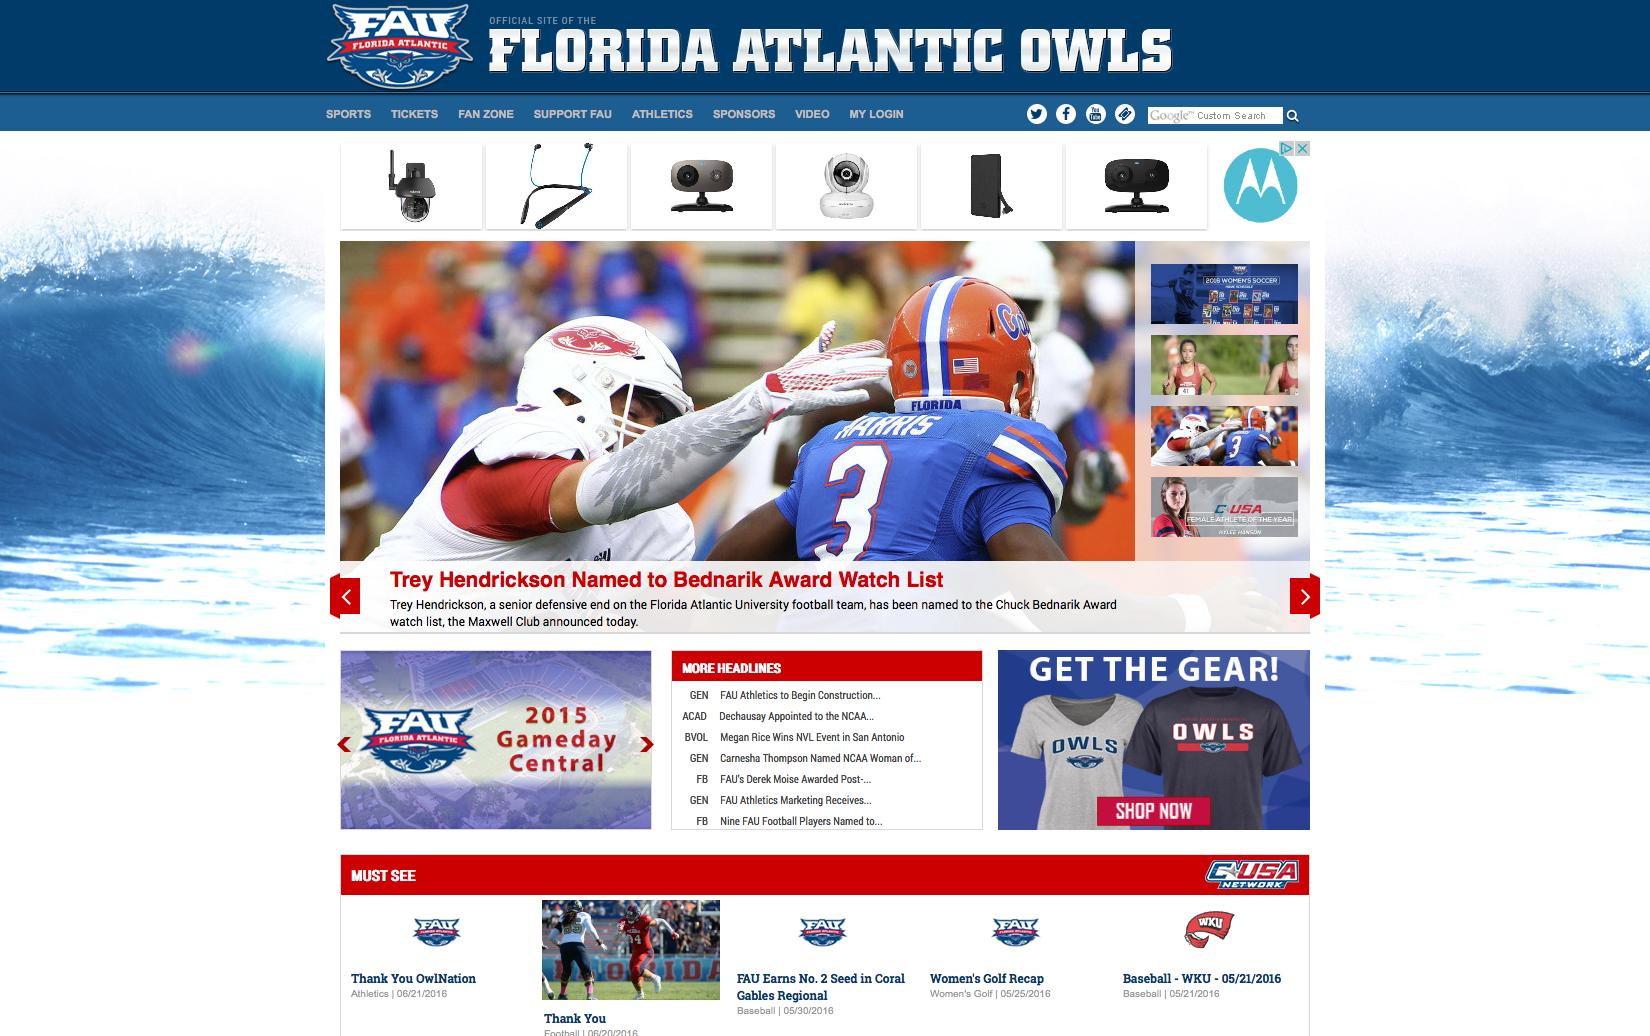 fausports.com_-_Florida_Atlantic_Official_Athletic_Site_-_2016-07-05_16.23.33.png